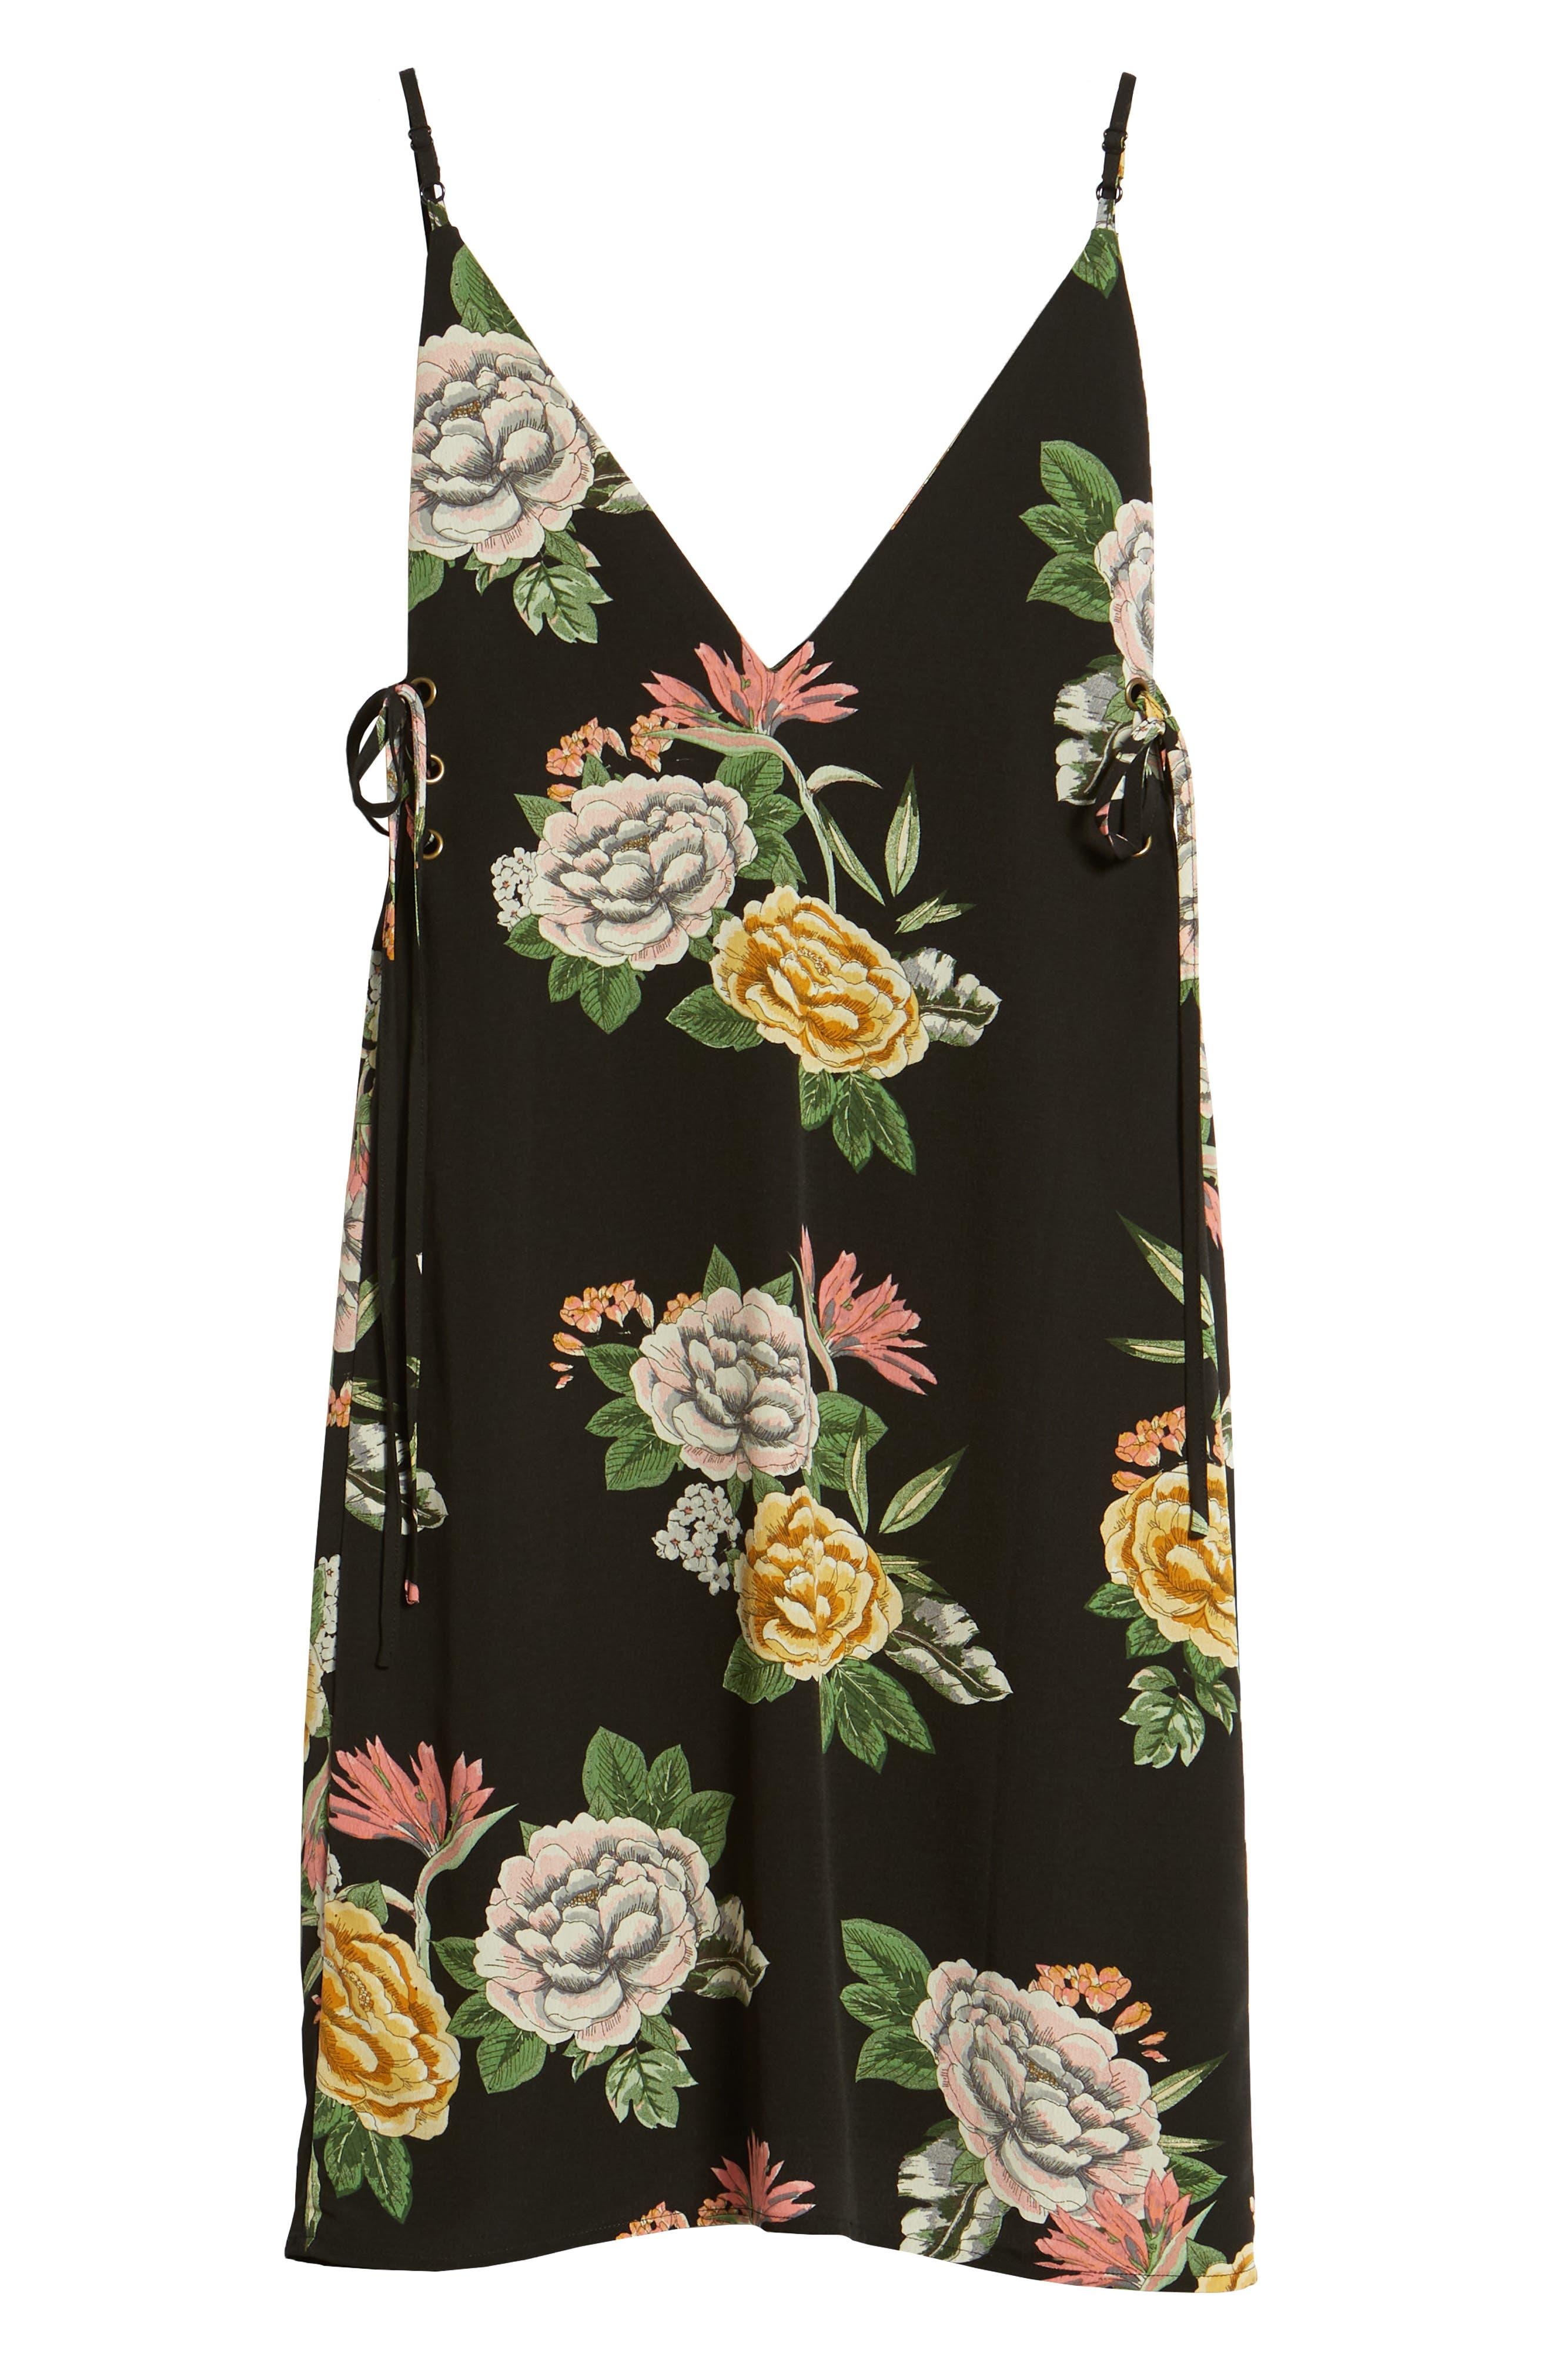 Enchanted Garden Lace-Up Dress,                             Alternate thumbnail 7, color,                             ENCHANTED GARDEN PRINT